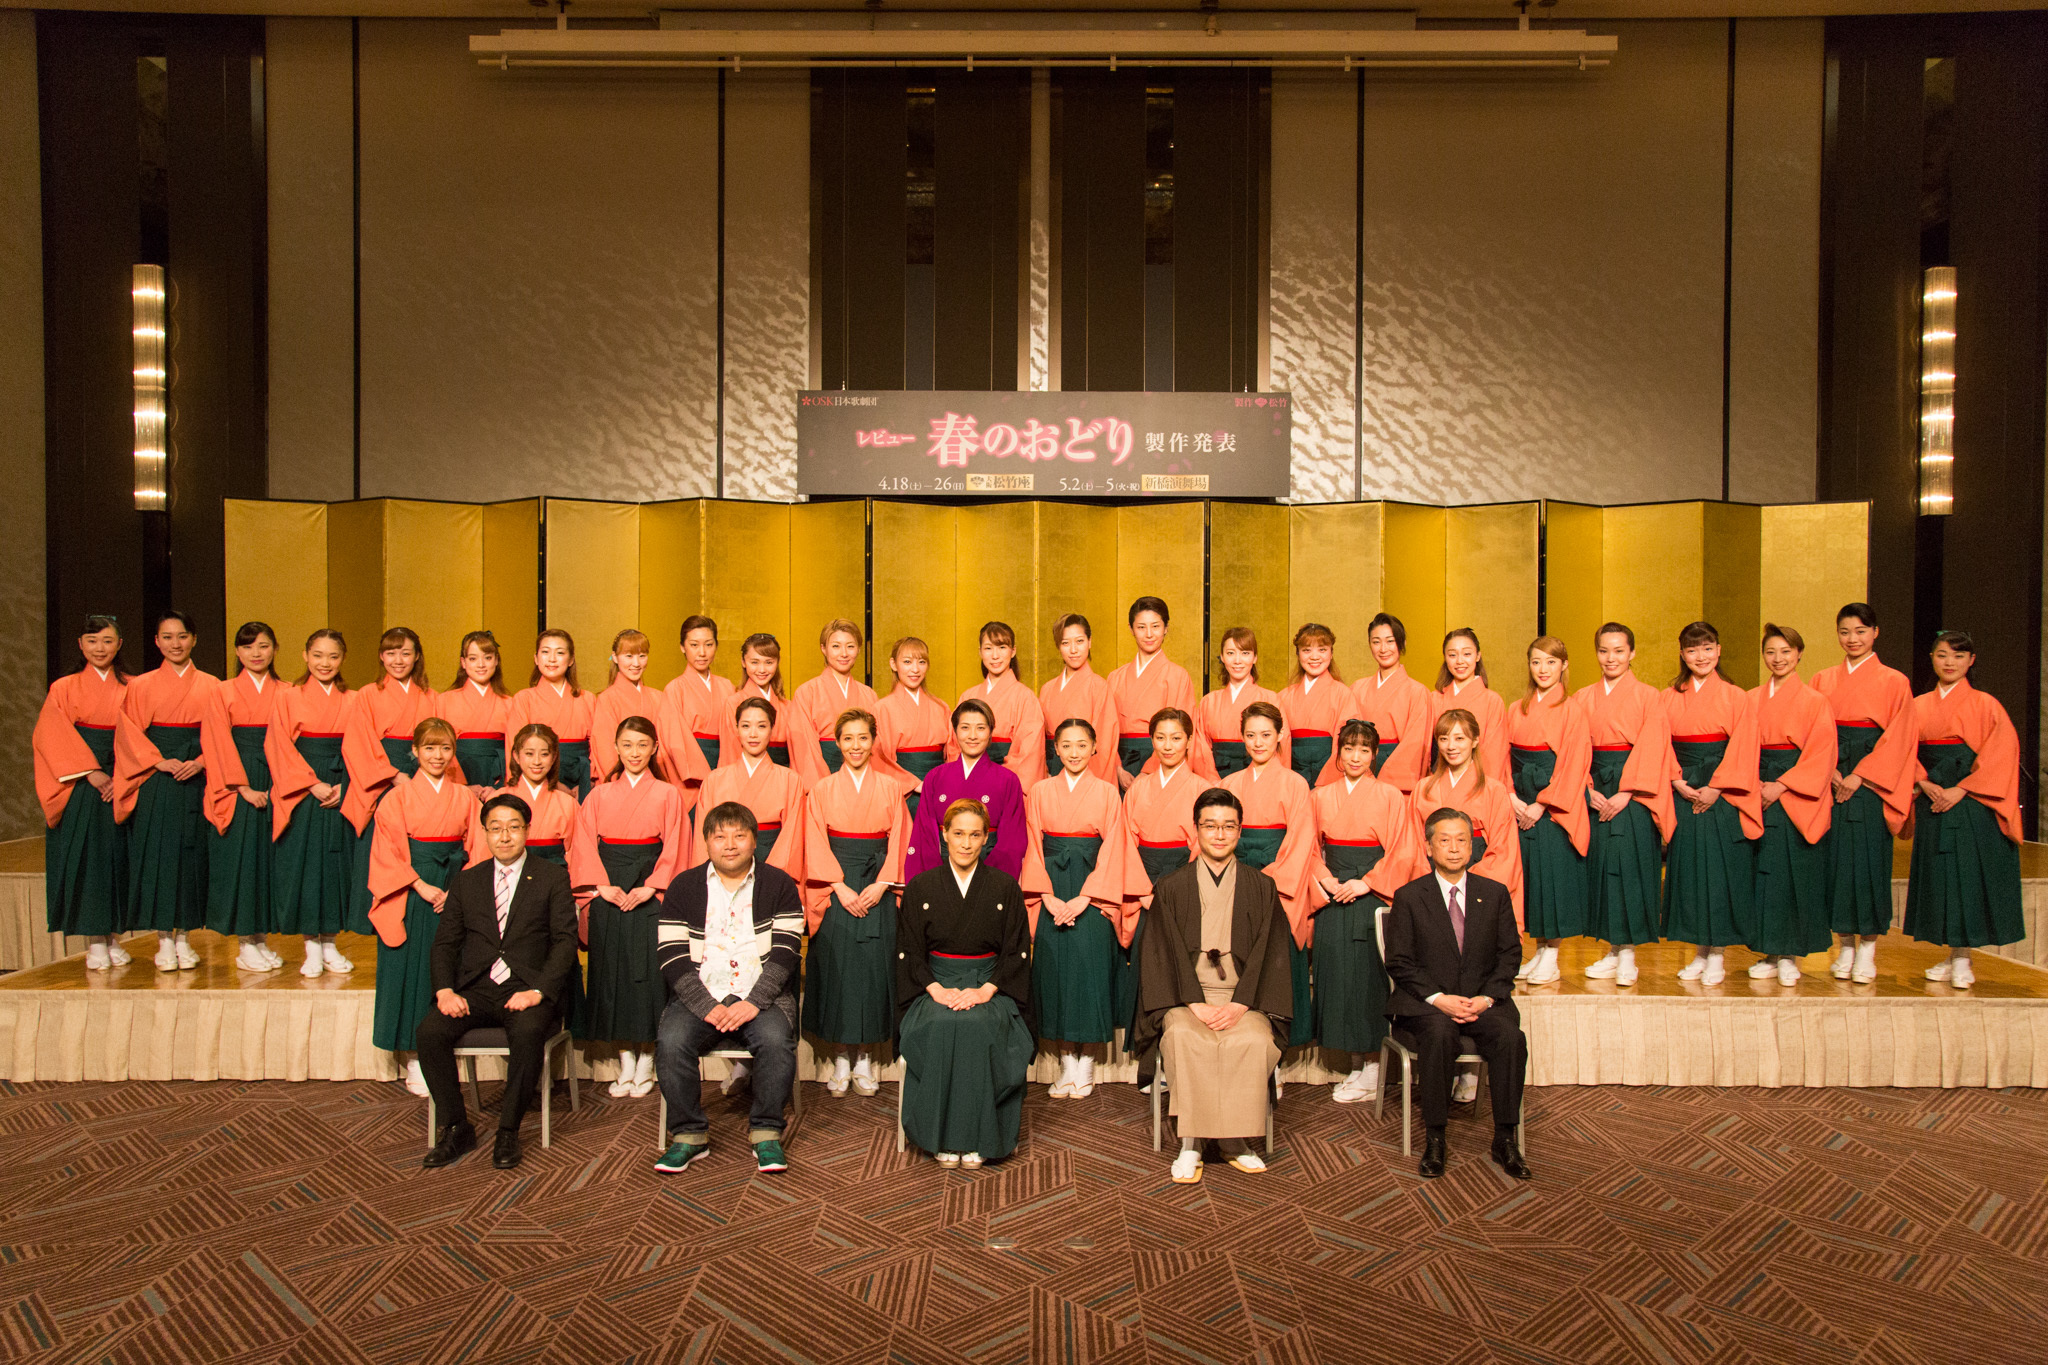 OSK日本歌劇団『レビュー 春のおどり』 撮影=田浦ボン